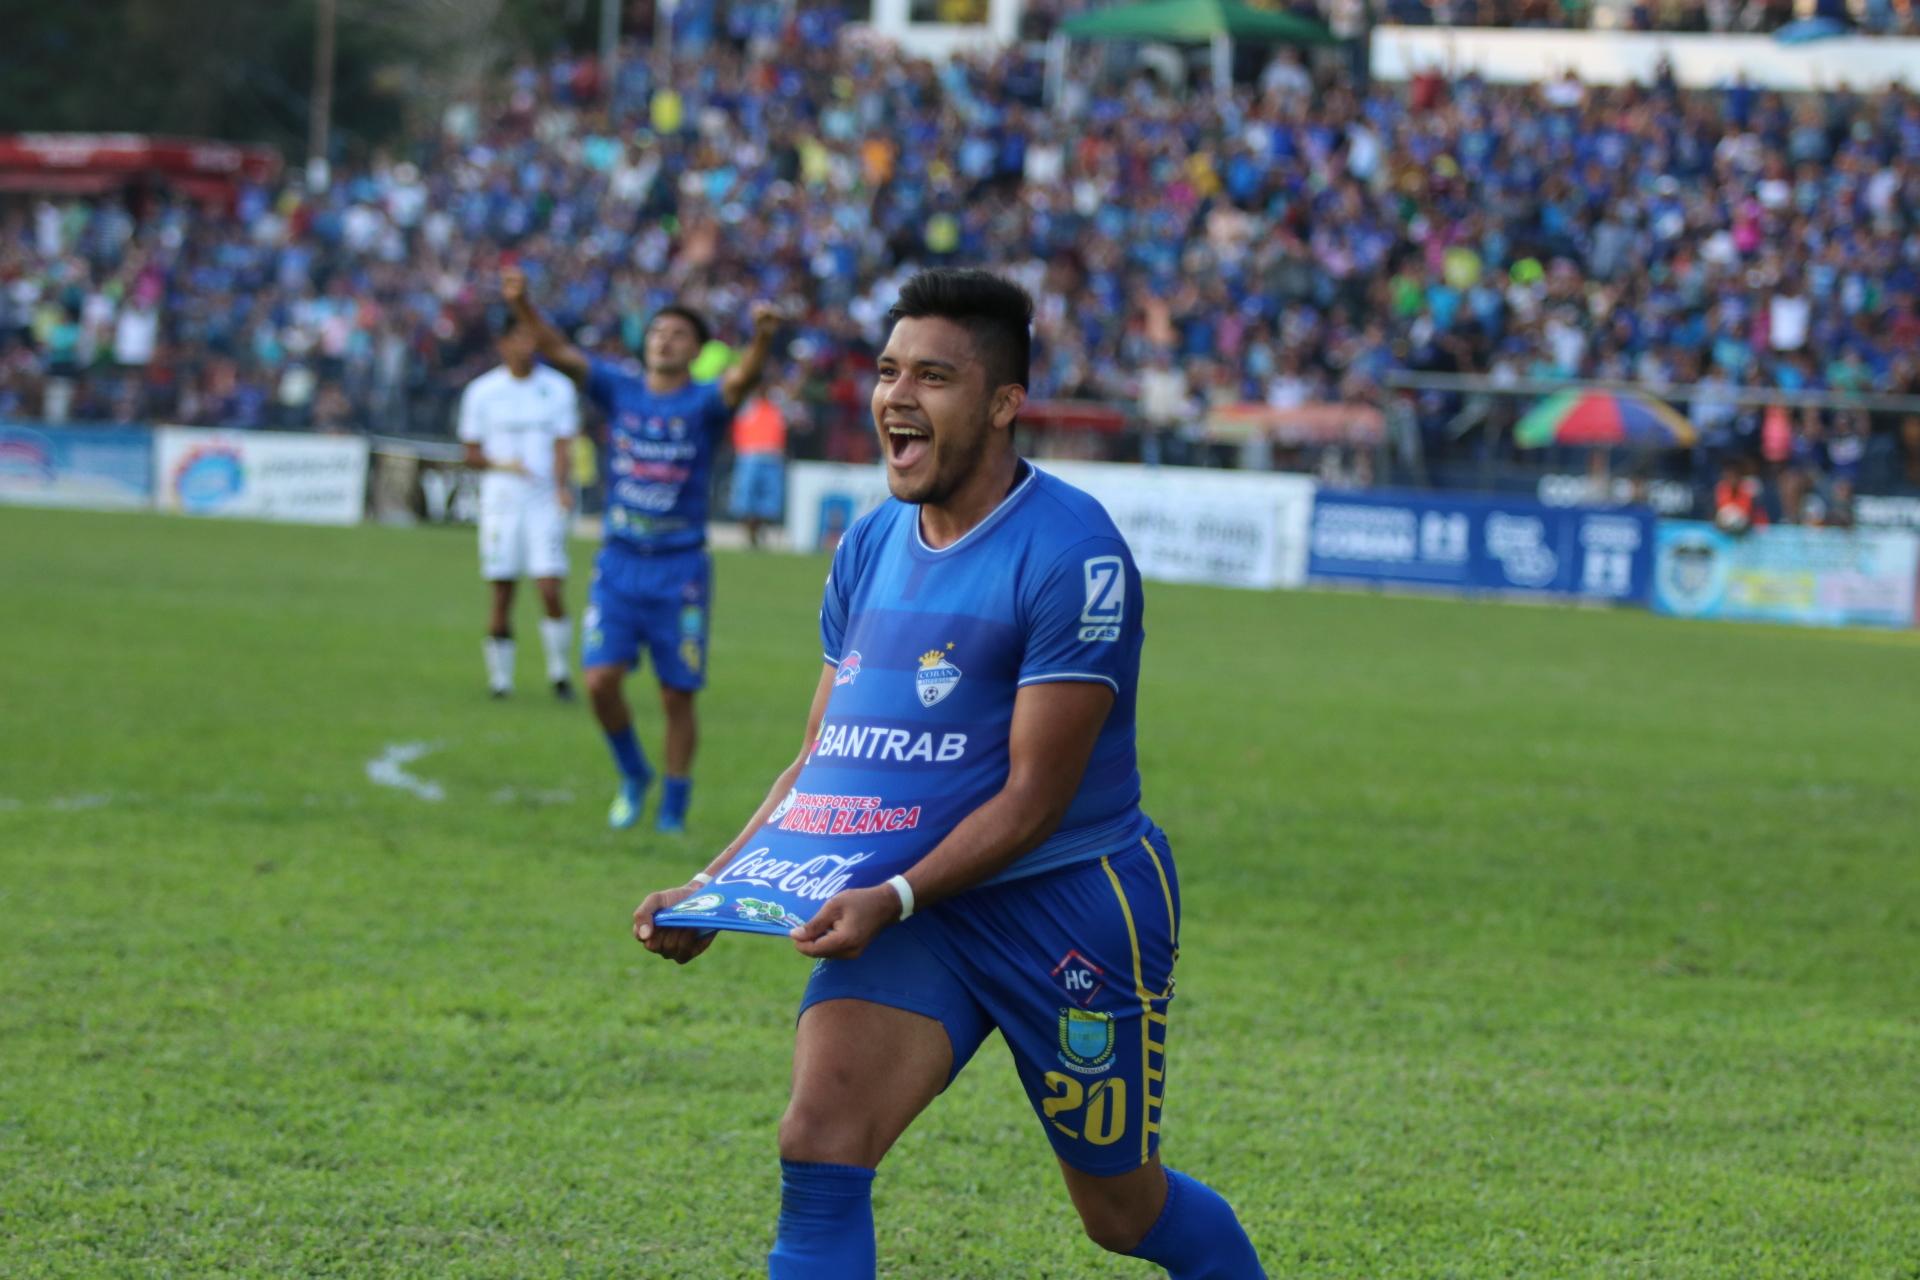 Víctor Guay celebra después de anotar el gol de la victoria de Cobán Imperial contra Comunicaciones. (Foto Prensa Libre: Eduardo Sam)